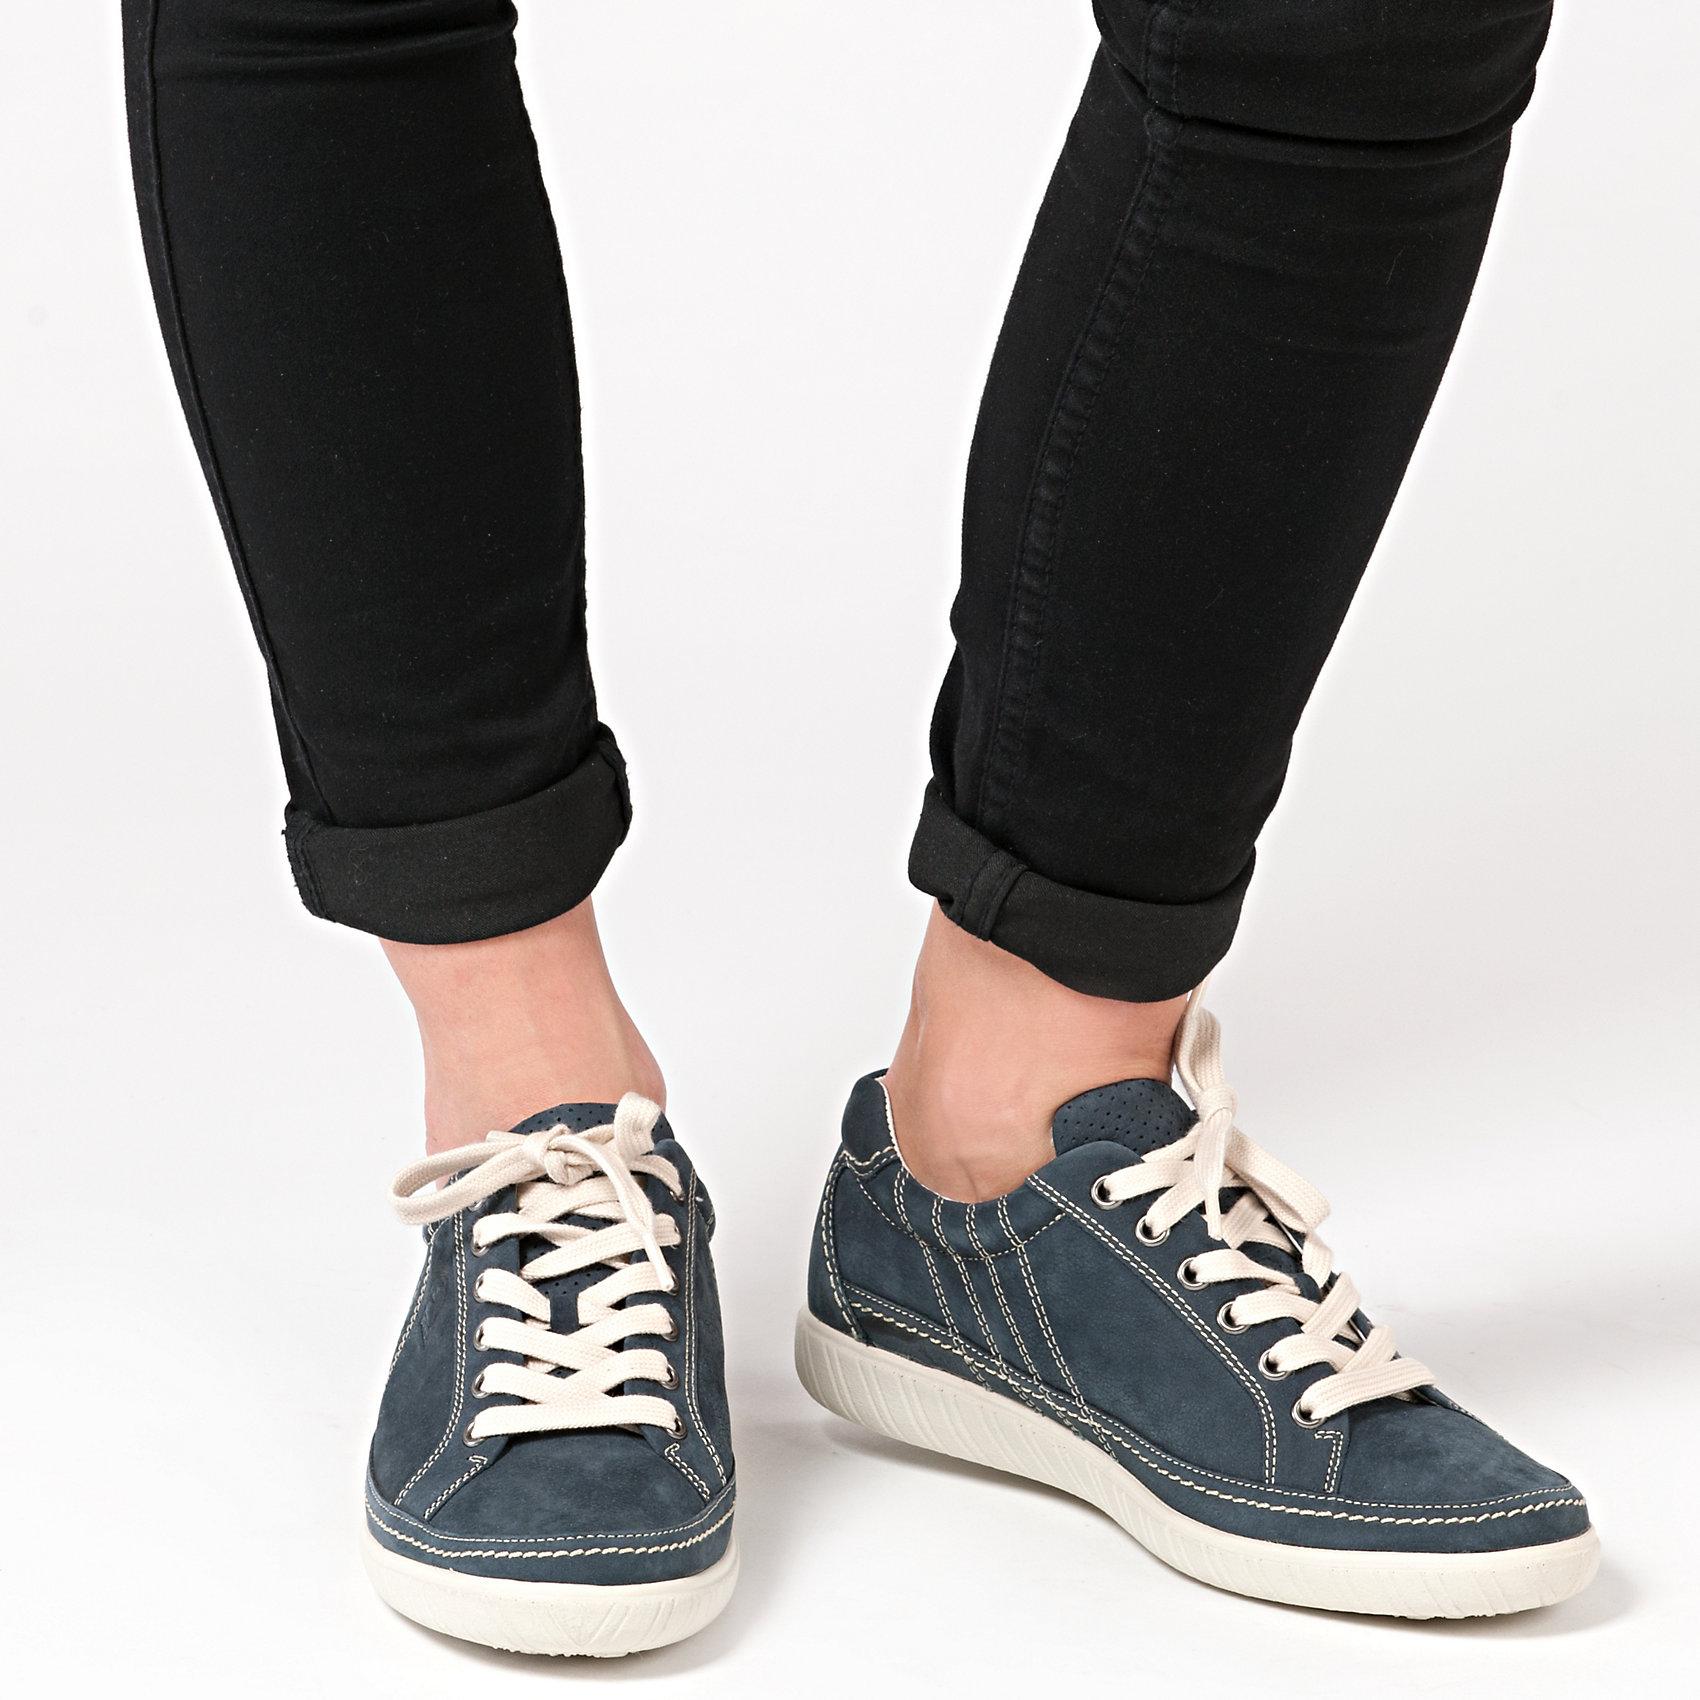 Neu Gabor 5751263 Sneakers blau grau schwarz 5751263 Gabor 5ac20d